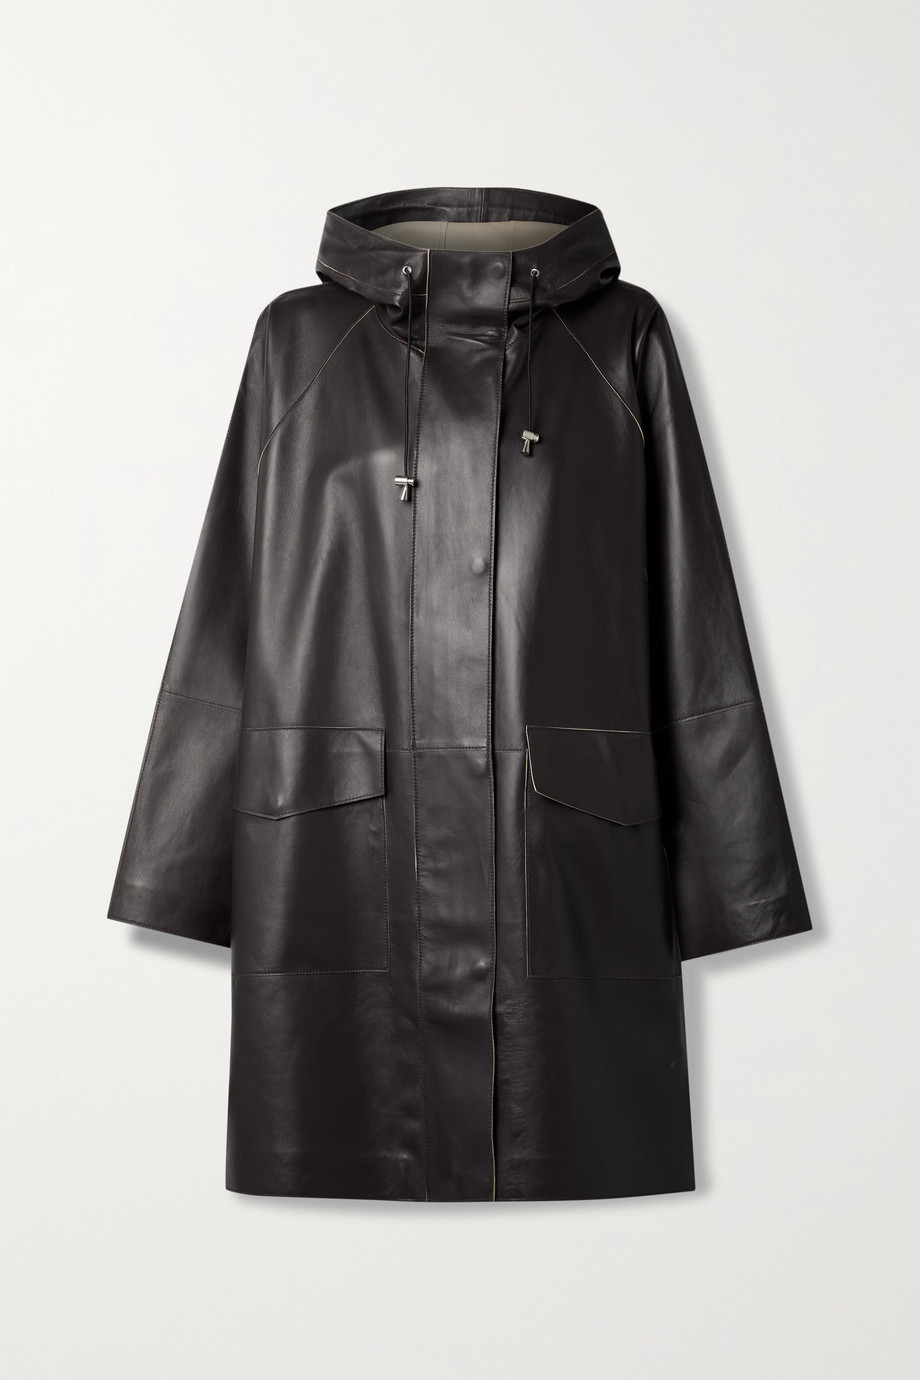 Stand Studio Dahlia oversized hooded leather coat